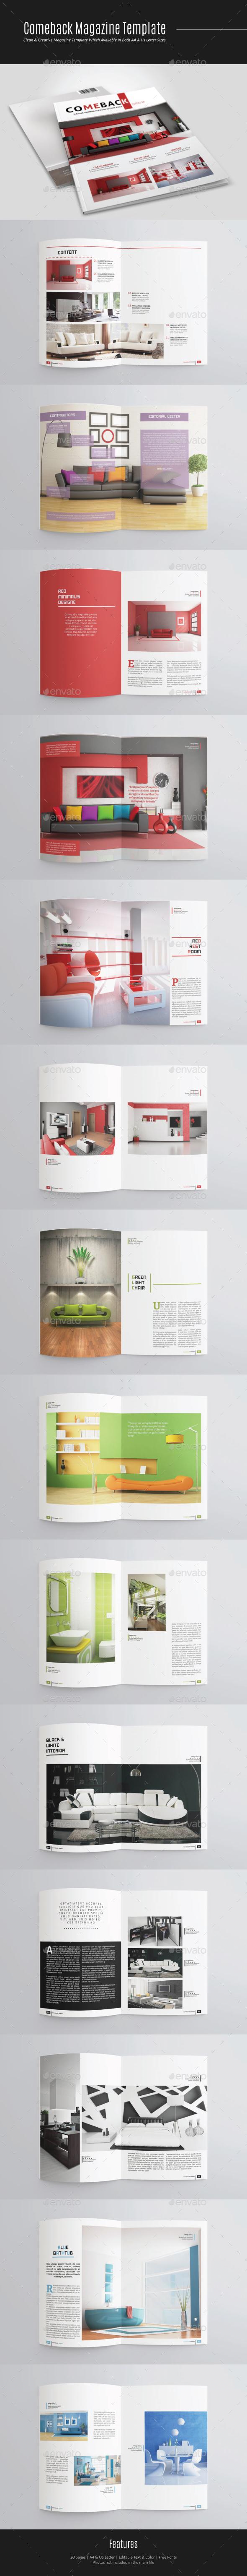 Comeback Magazine Template - Magazines Print Templates